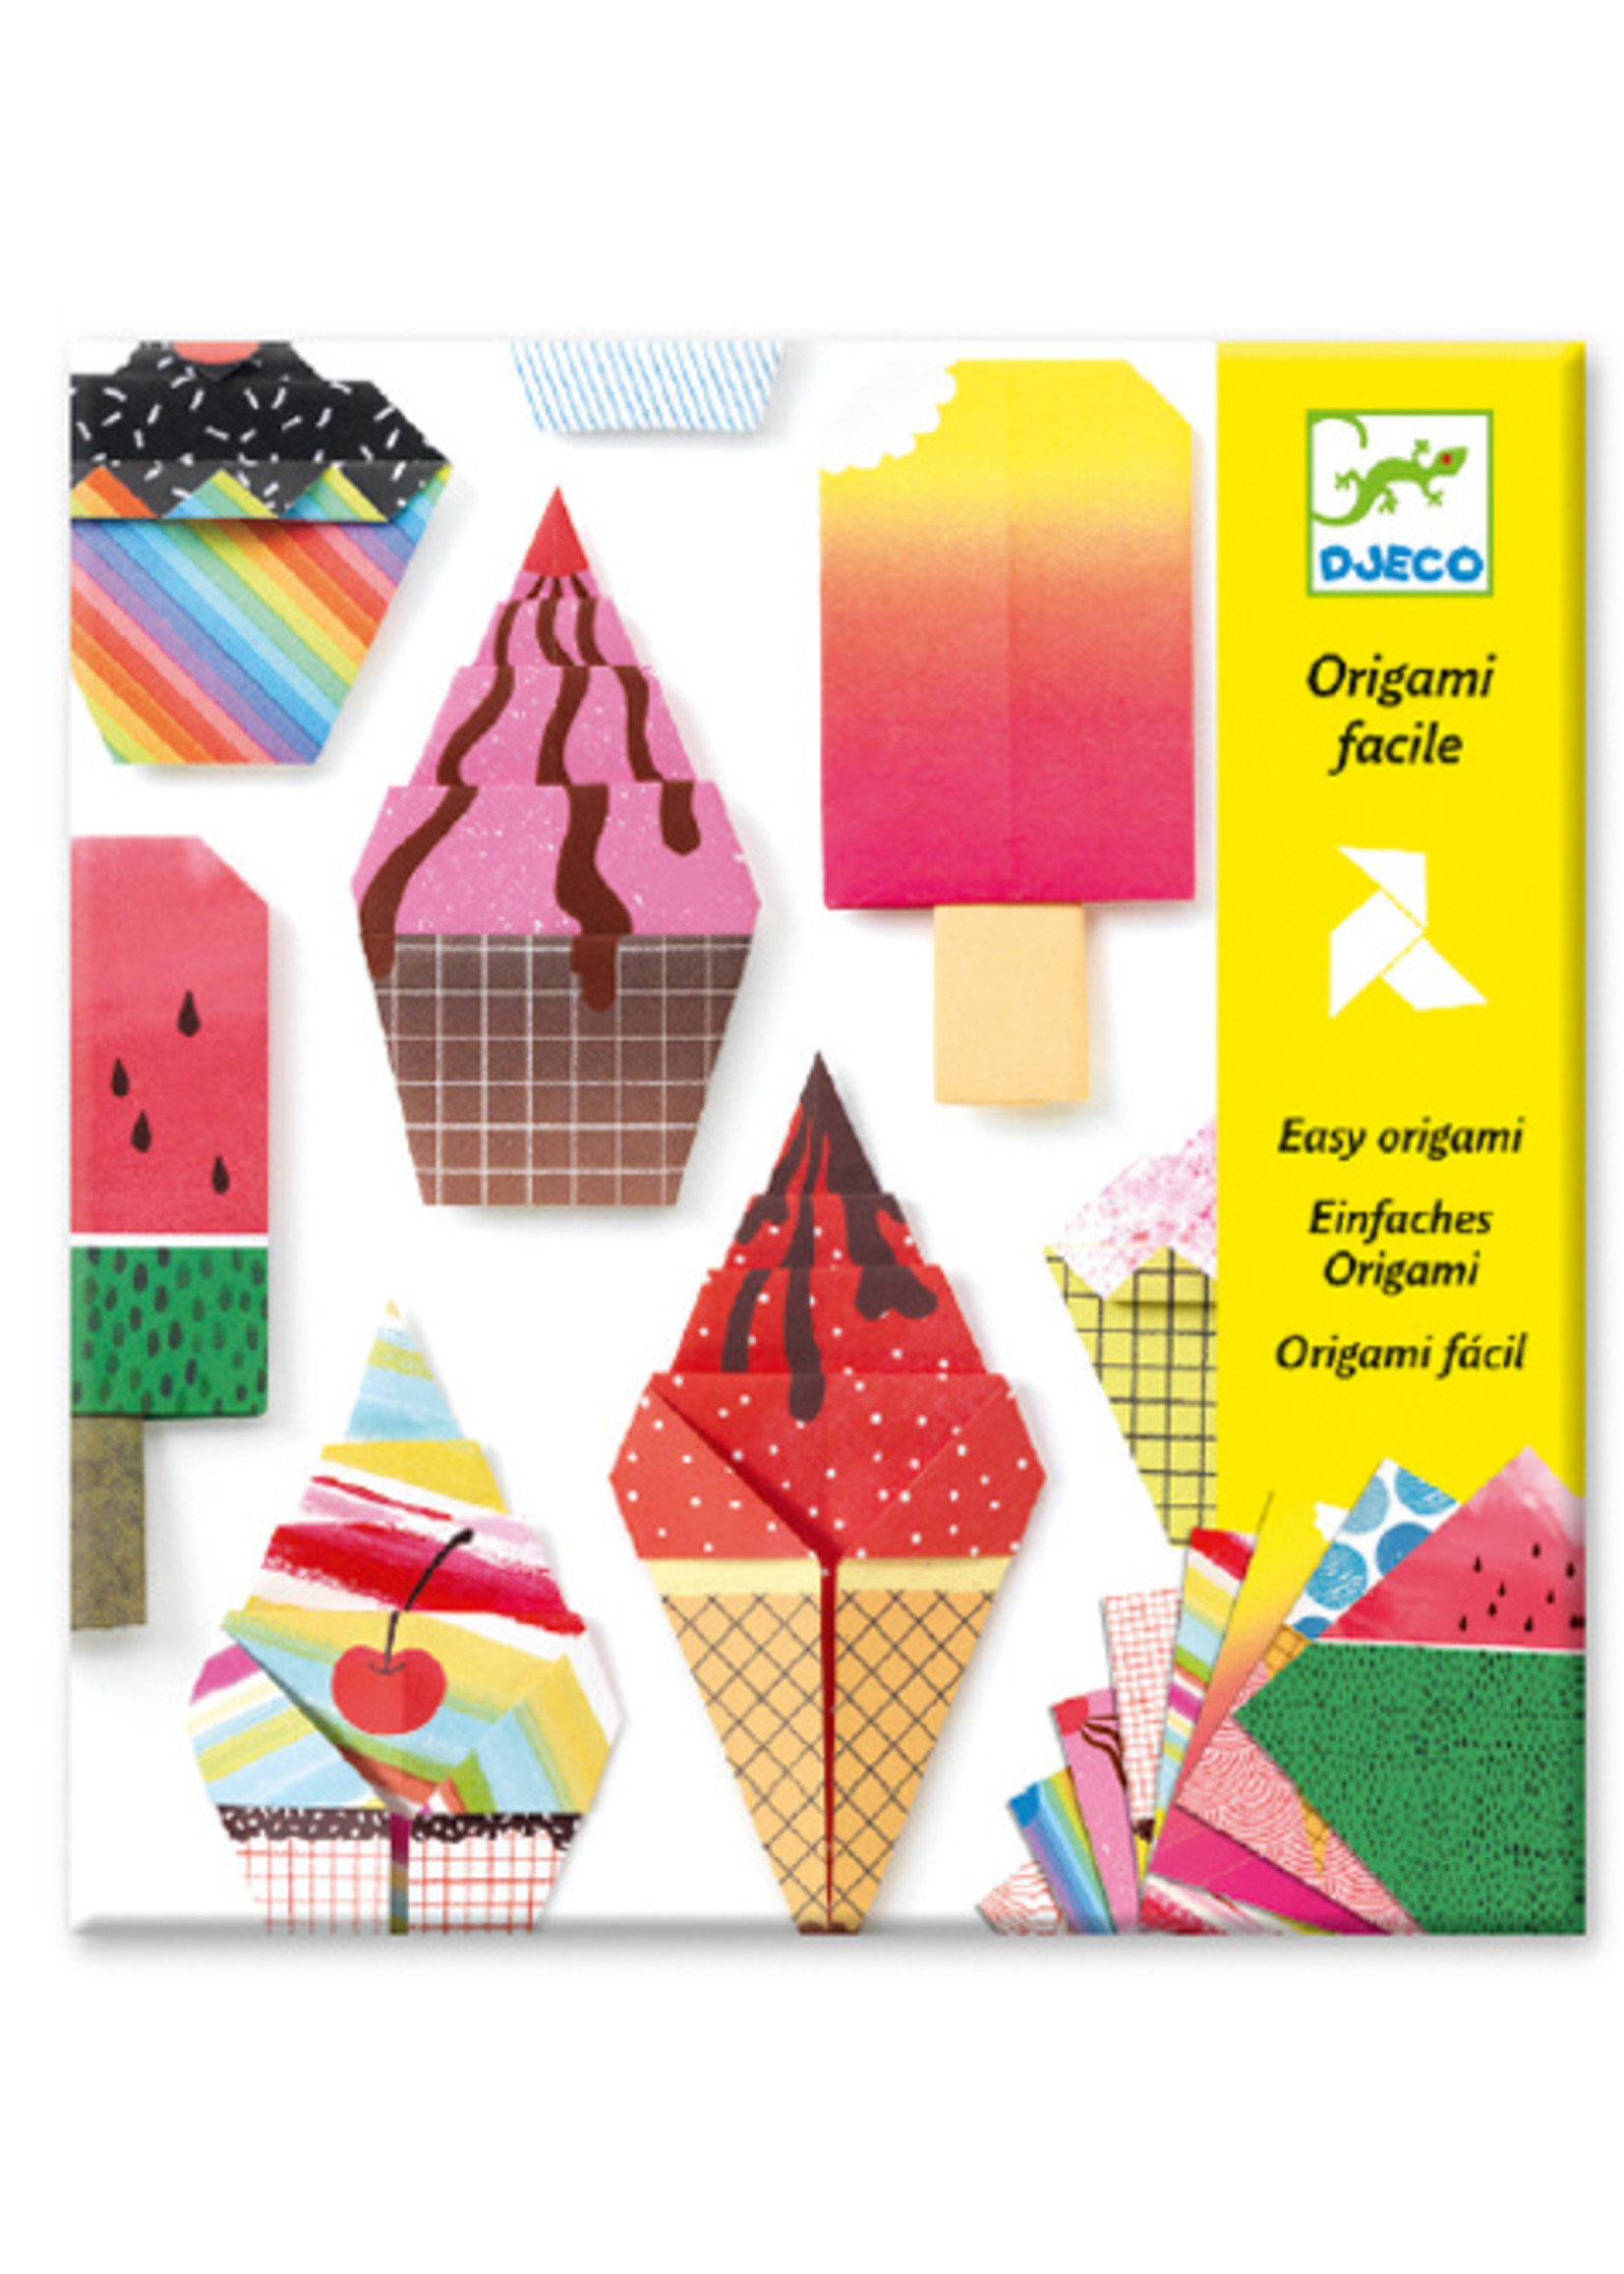 Djeco Origami -Délices